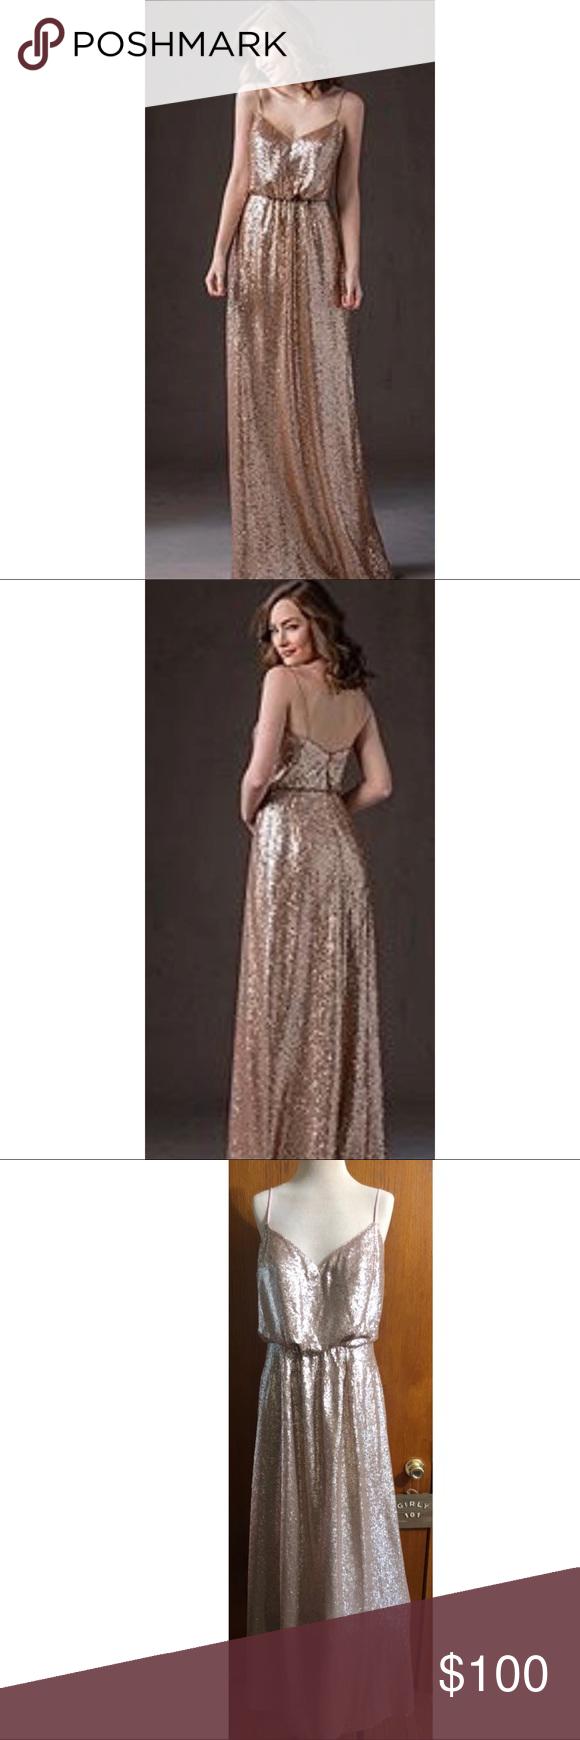 Belsoie sequin rose gold long dress brides made my posh closet